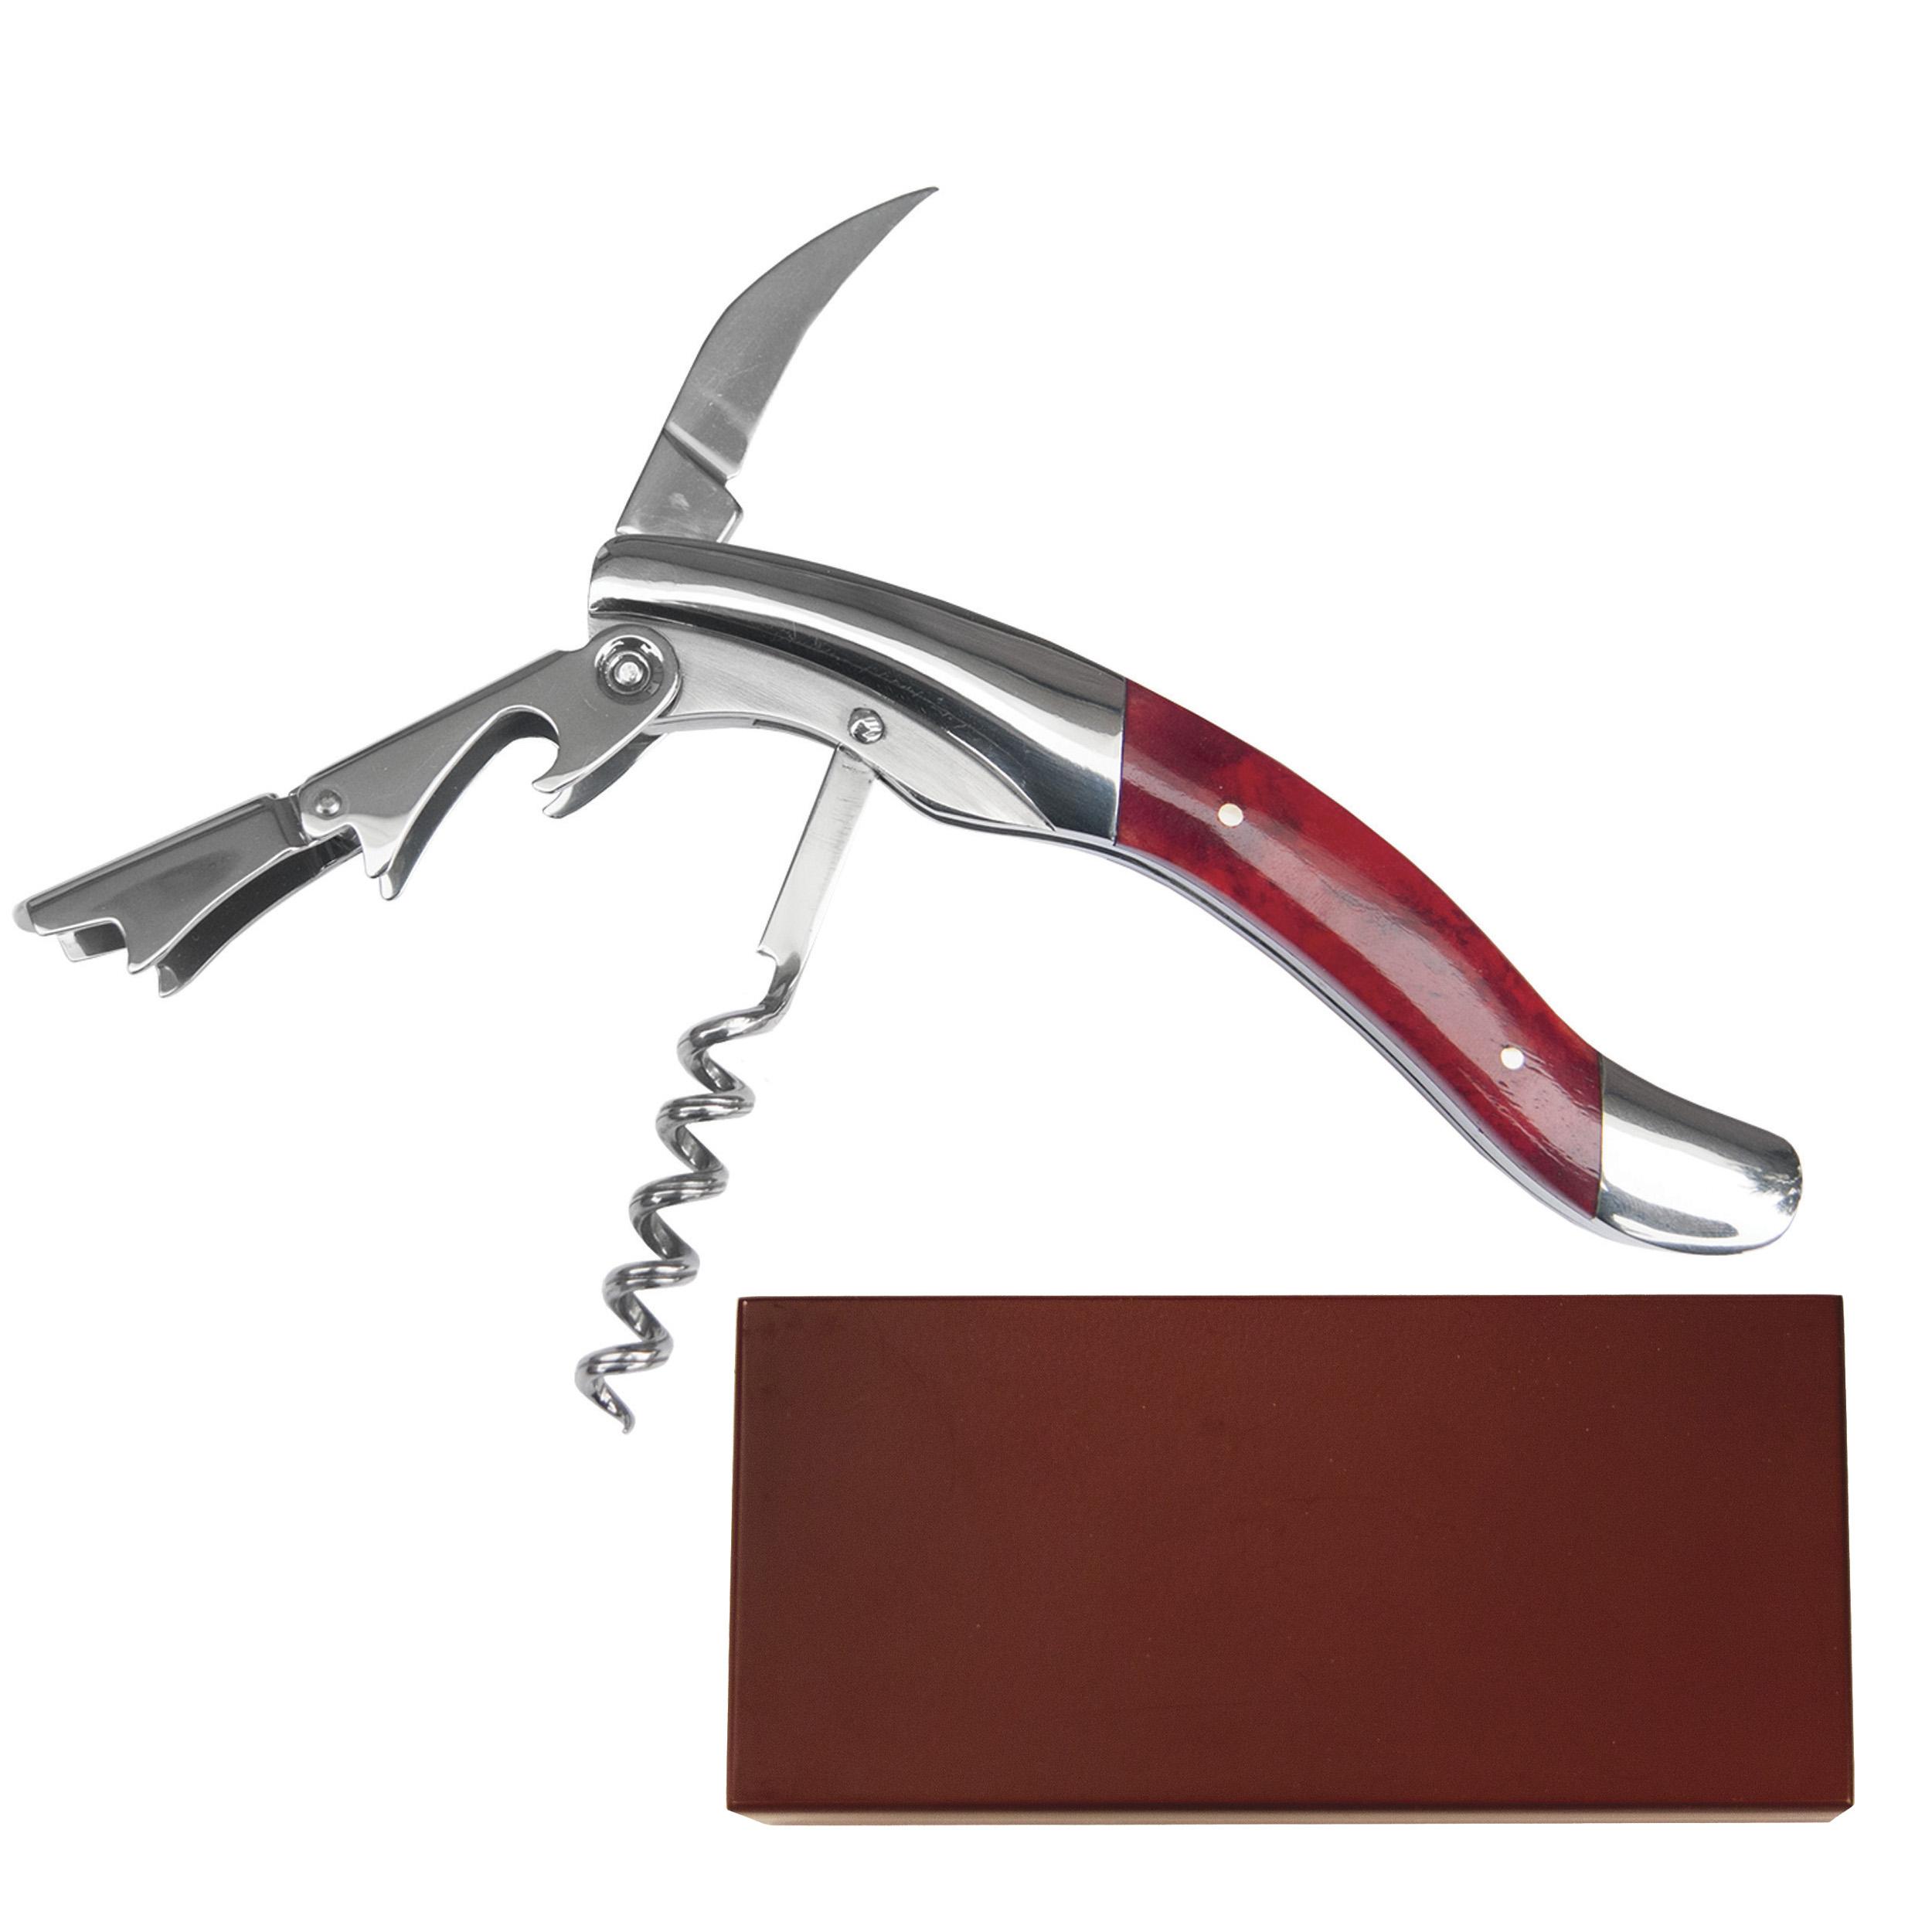 Cabernet - Red Bone Steward Wine Tool, Stainless Steel